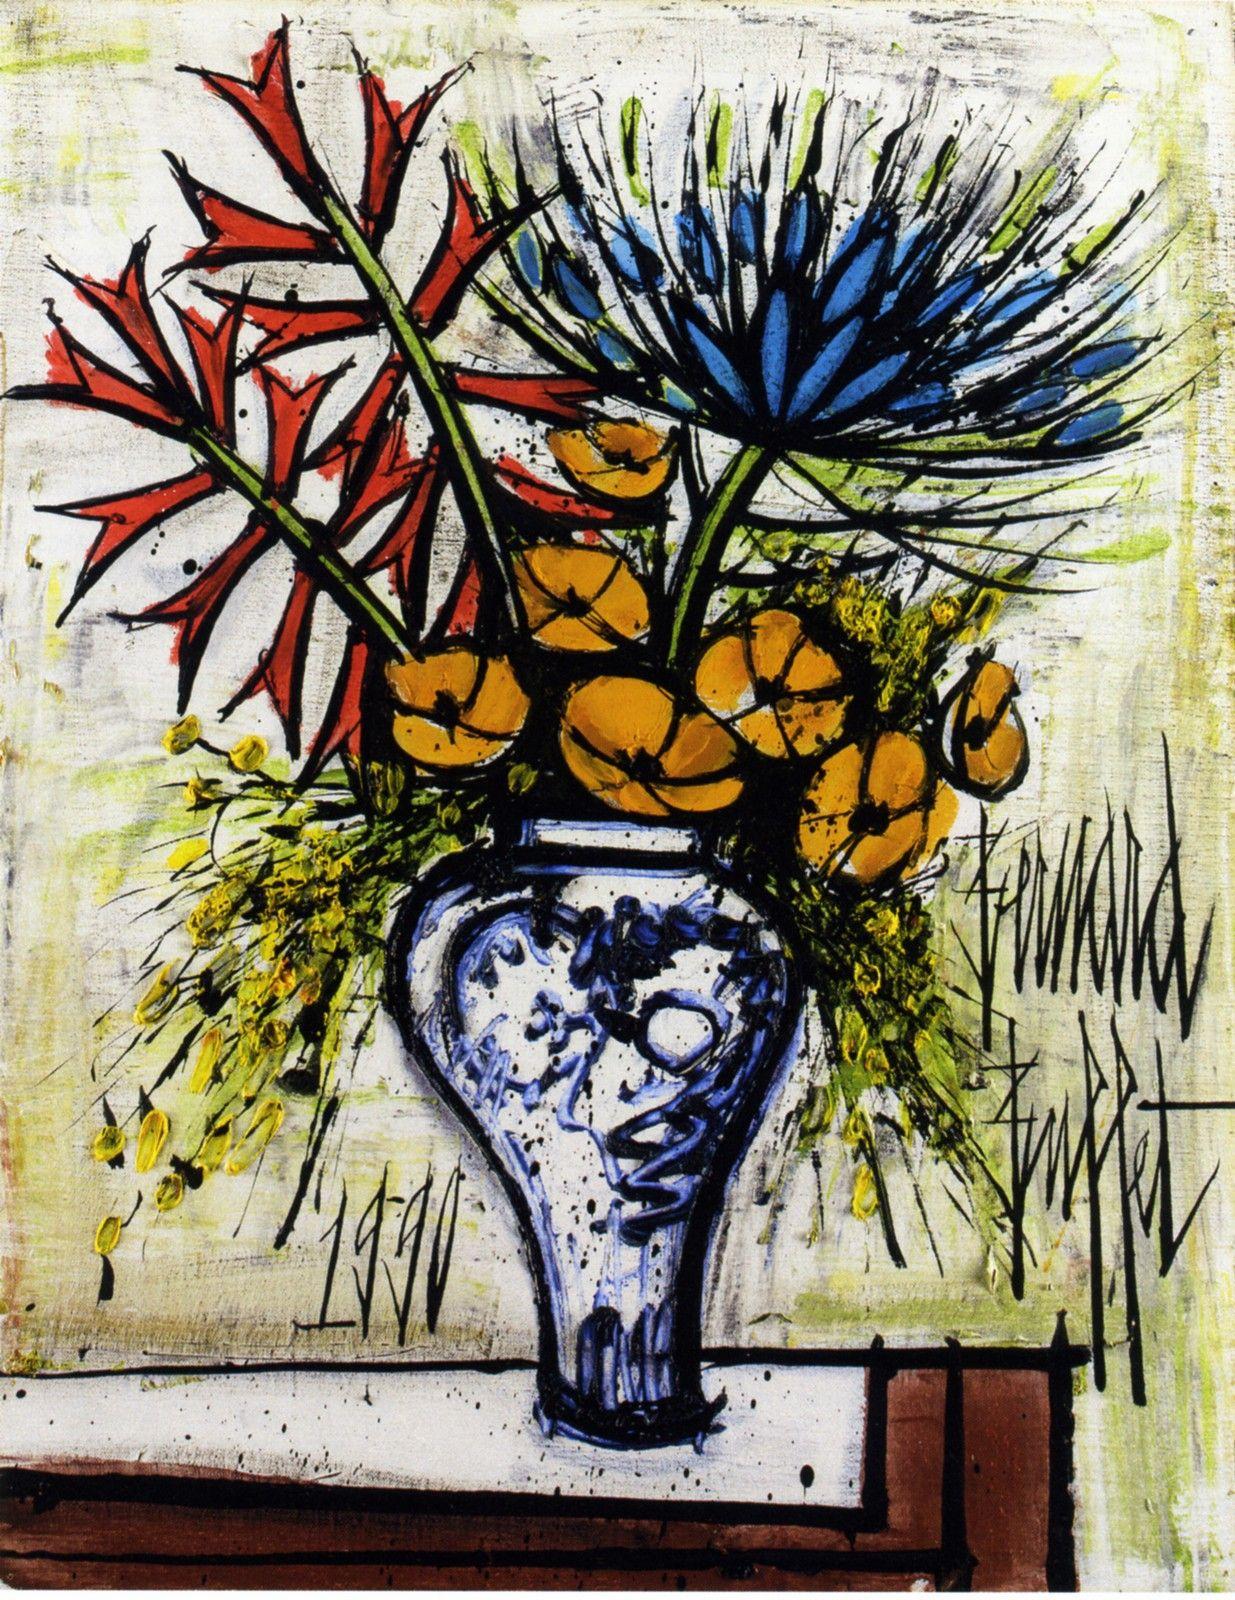 Buffet Bernard-2 | Peinture artistique, Art français, Peintures florales